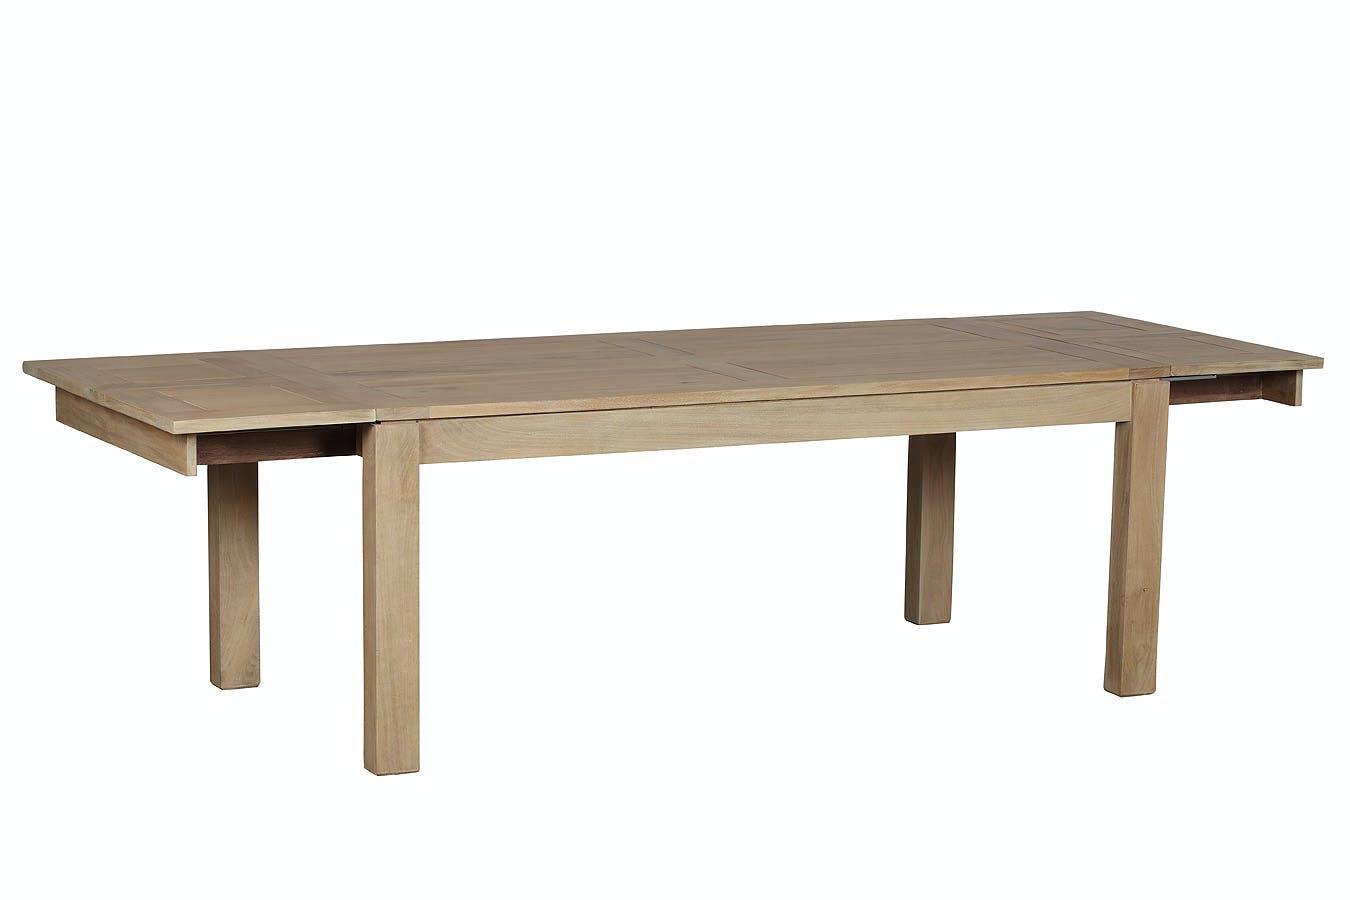 Table de repas extensible Manguier massif 160/250x100x78cm BOREAL CLAIR